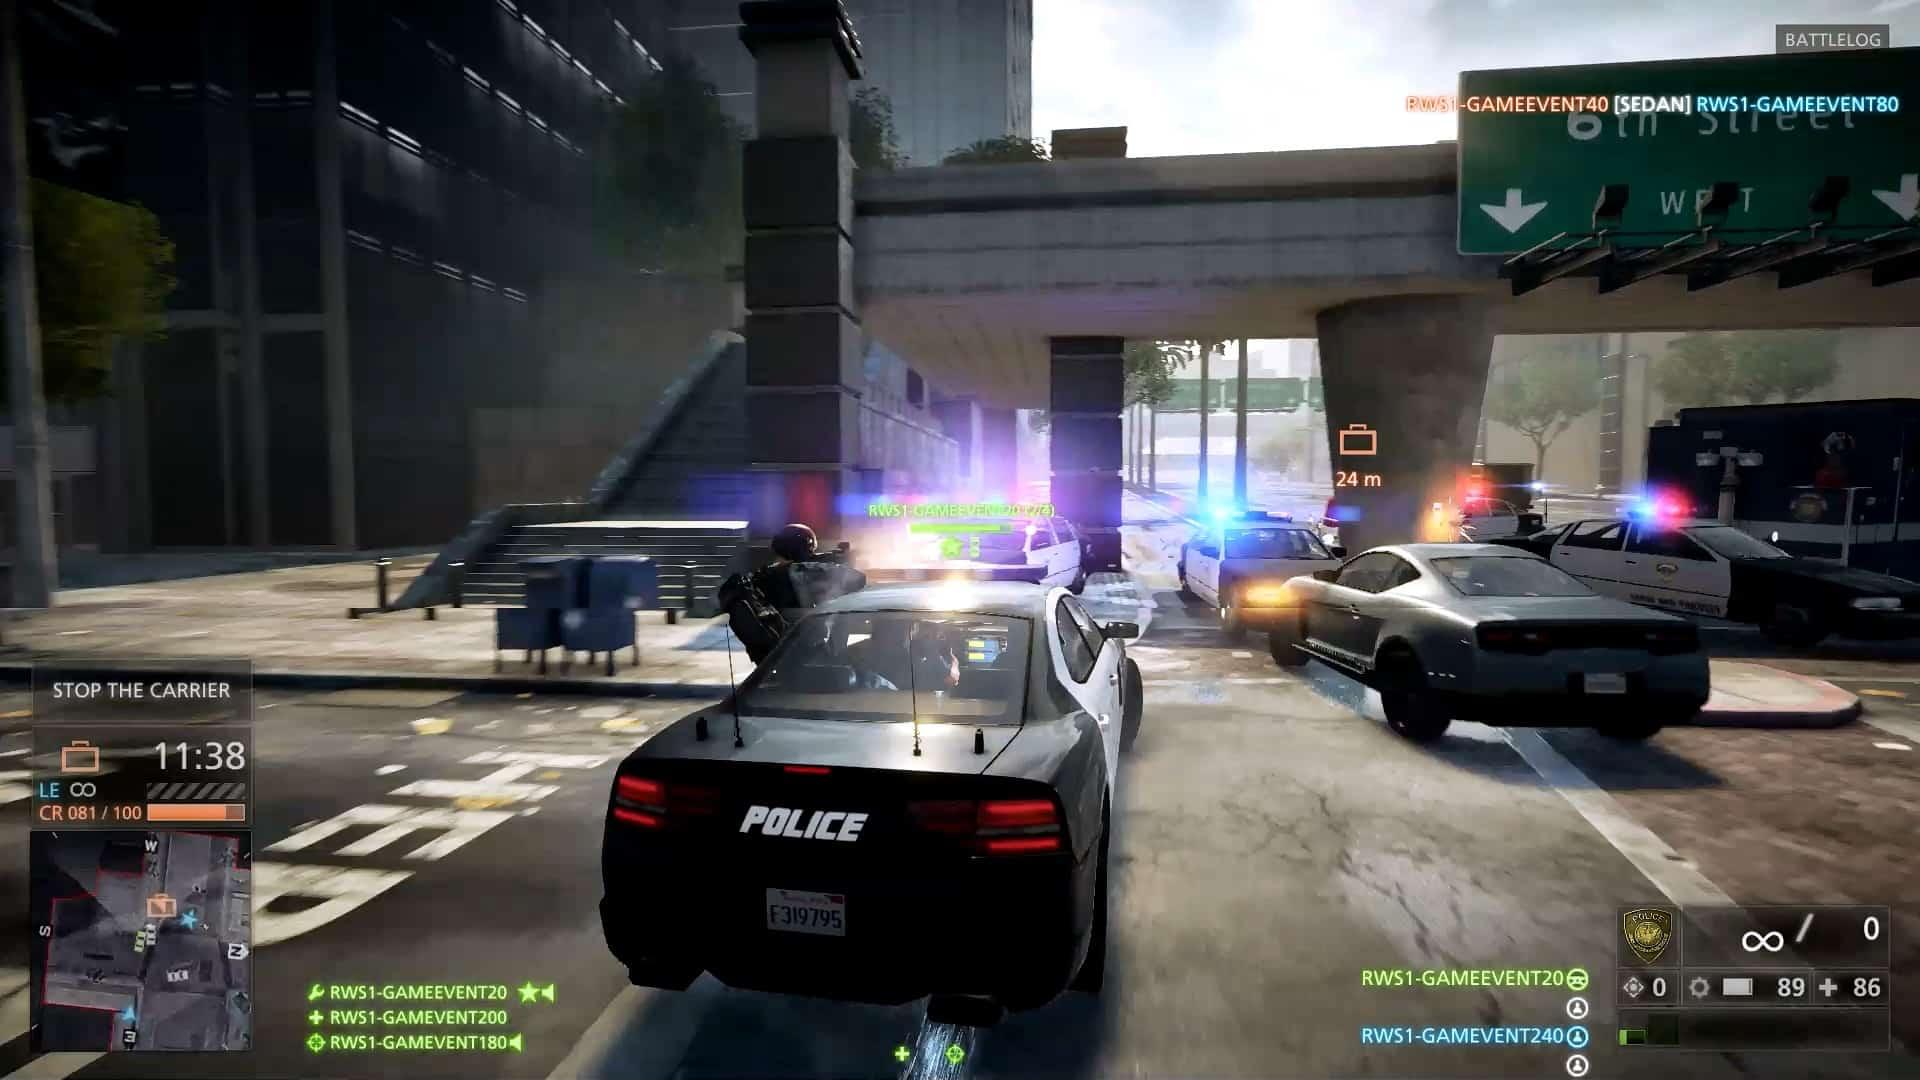 http://install-game.com/wp-content/uploads/2015/04/battlefield-hardline-3.jpg